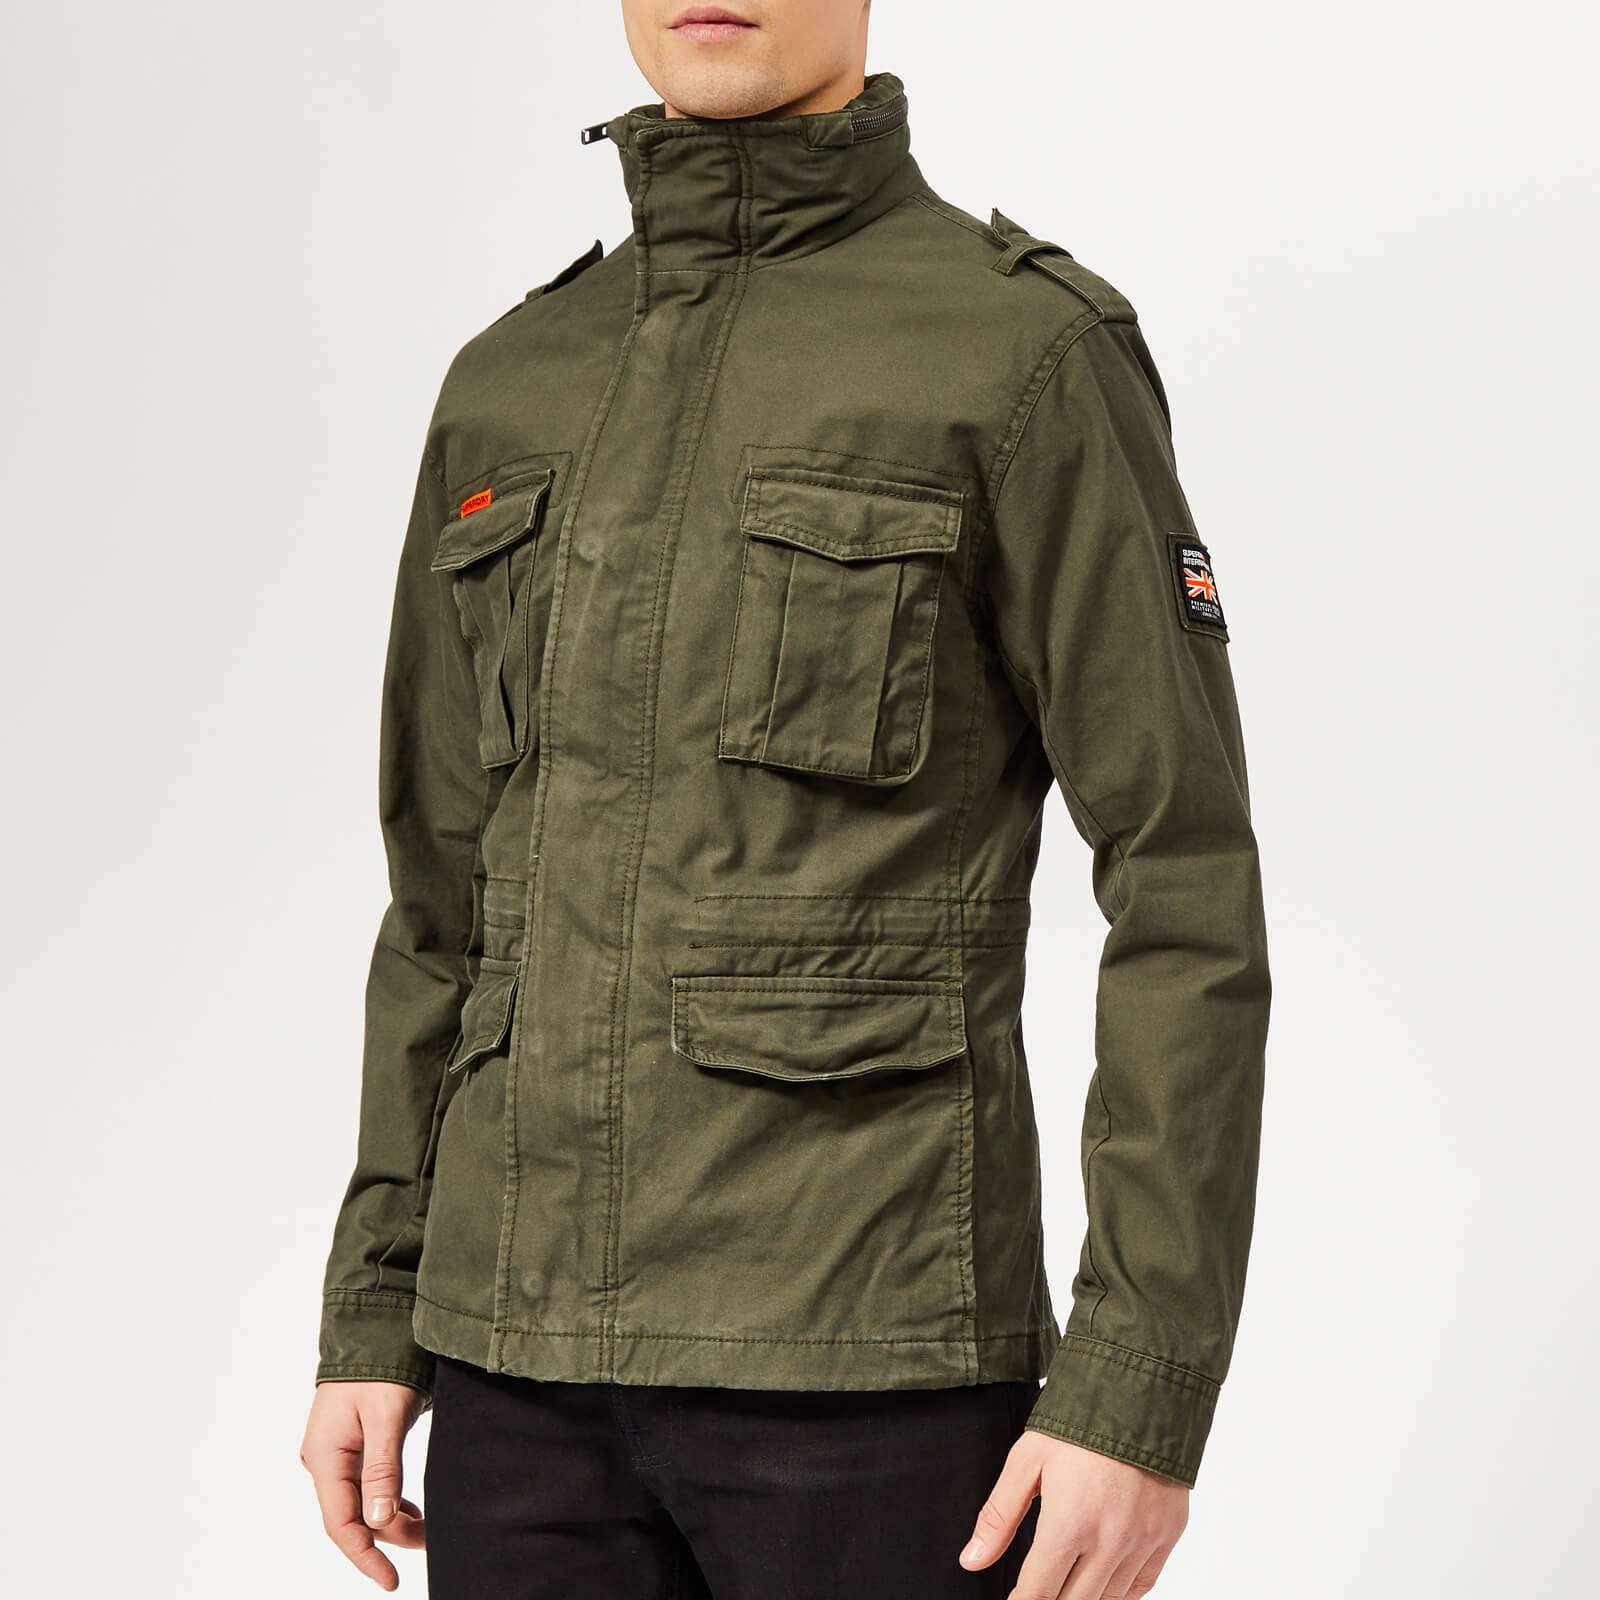 Superdry Rookie Military Jacket Green | Coats & Tops | Men's